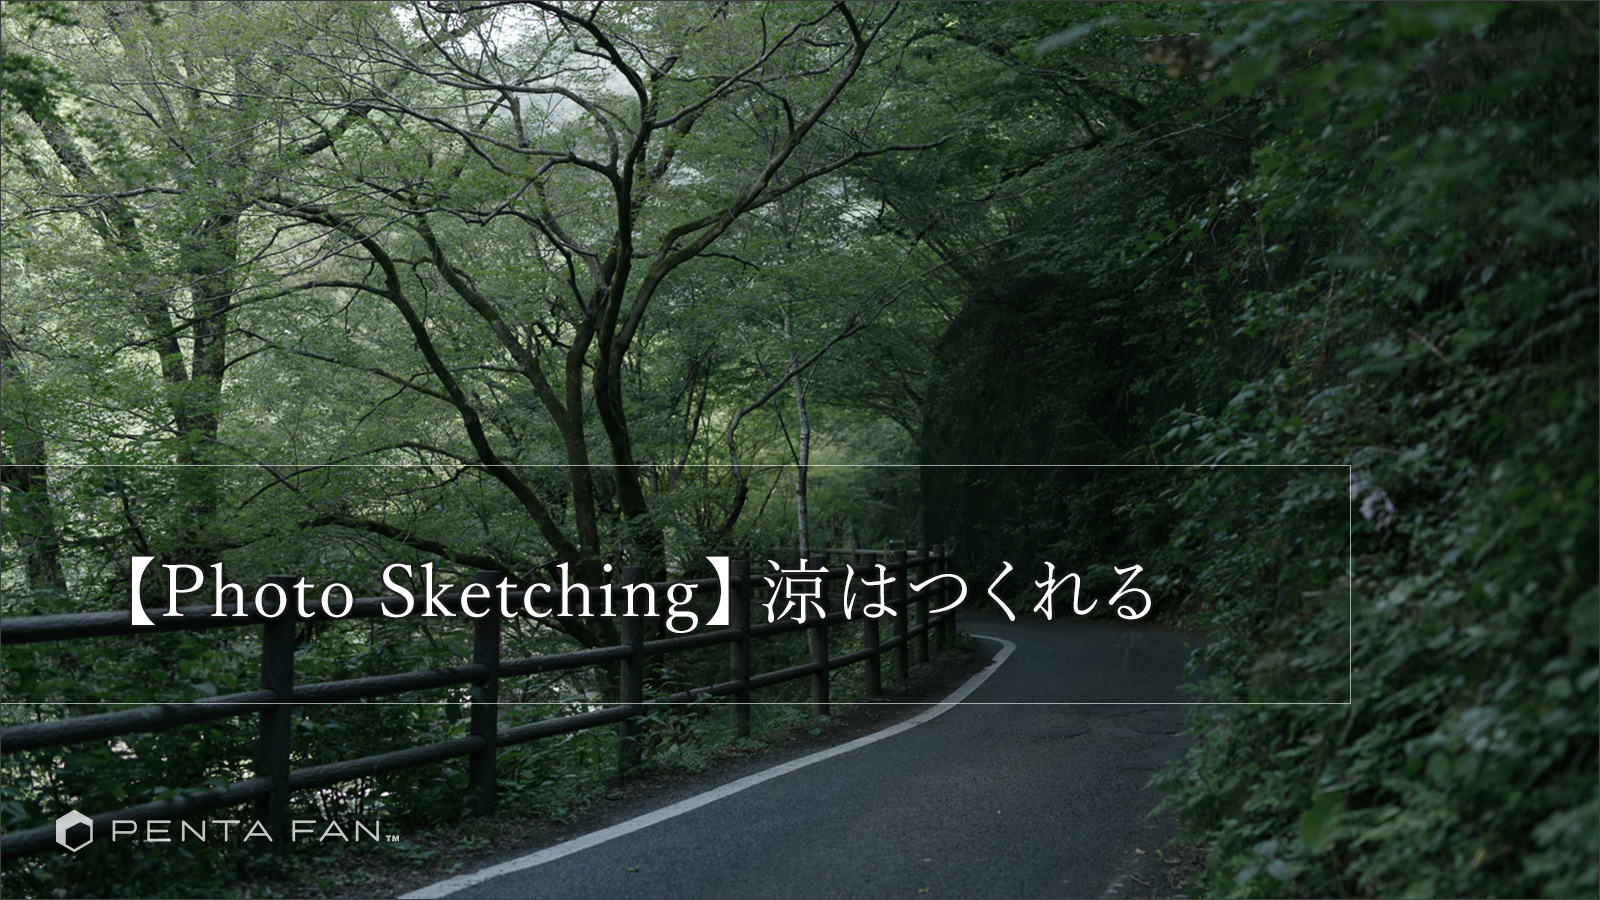 【Photo Sketching】旅は願望、ほのかで涼を